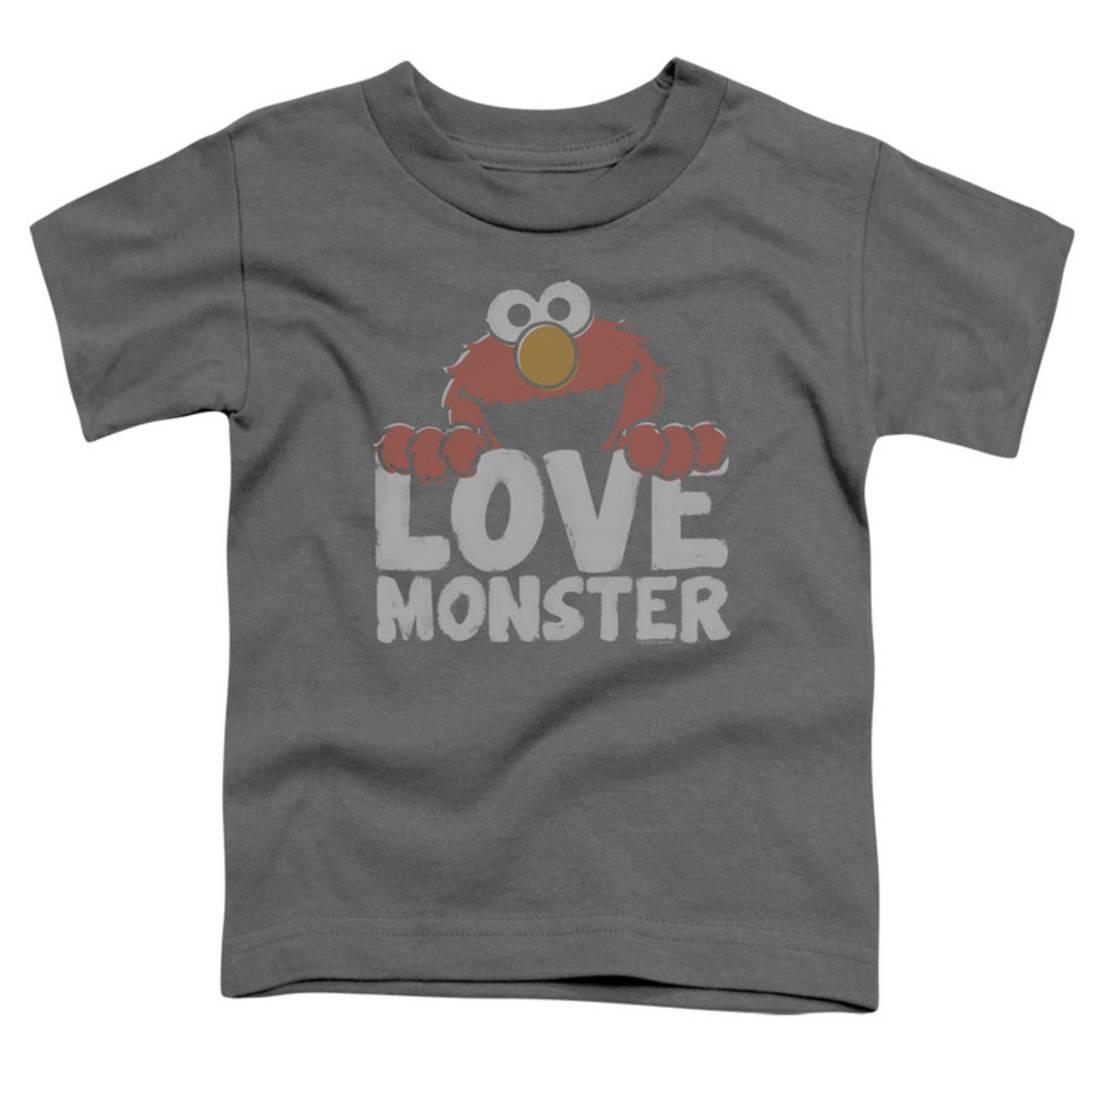 Toddler: Sesame Street- Elmo Love Monster Apparel Baby T-Shirt - Grey